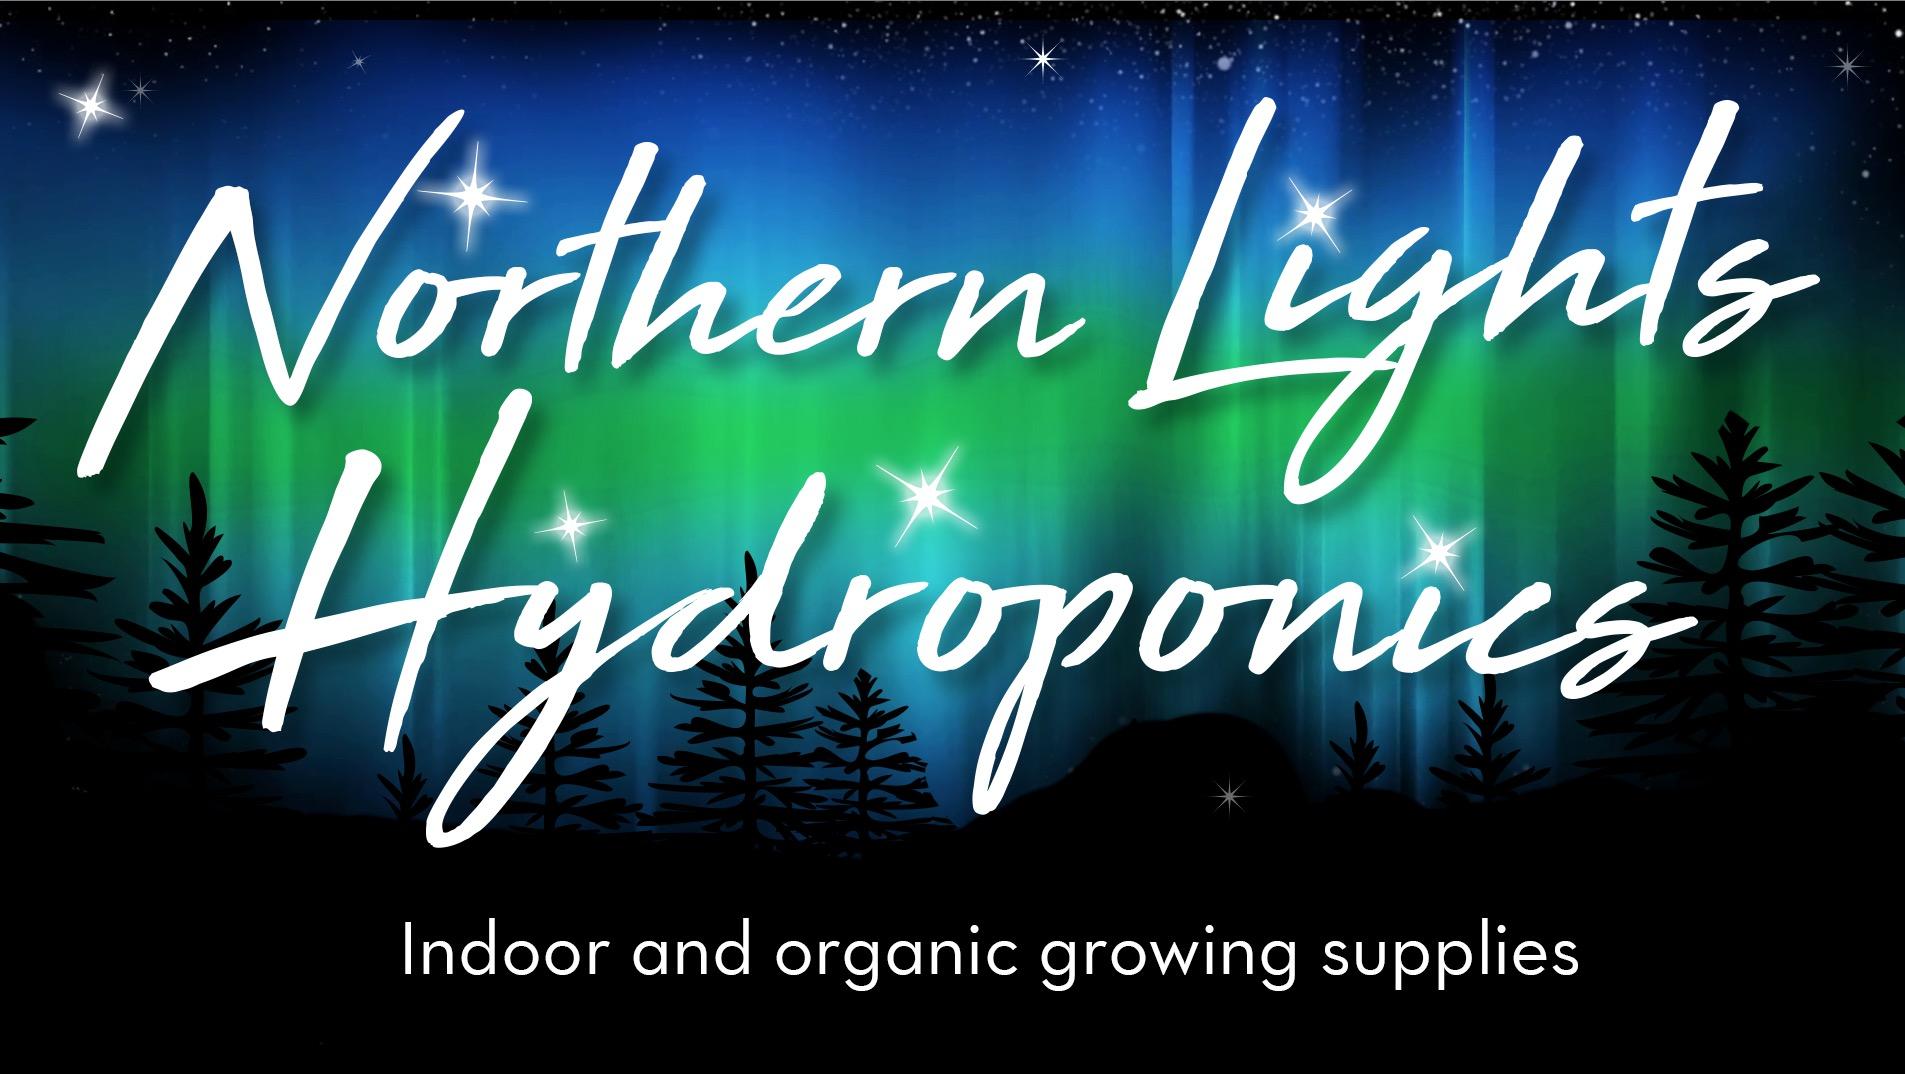 Northern Lights Hydroponics